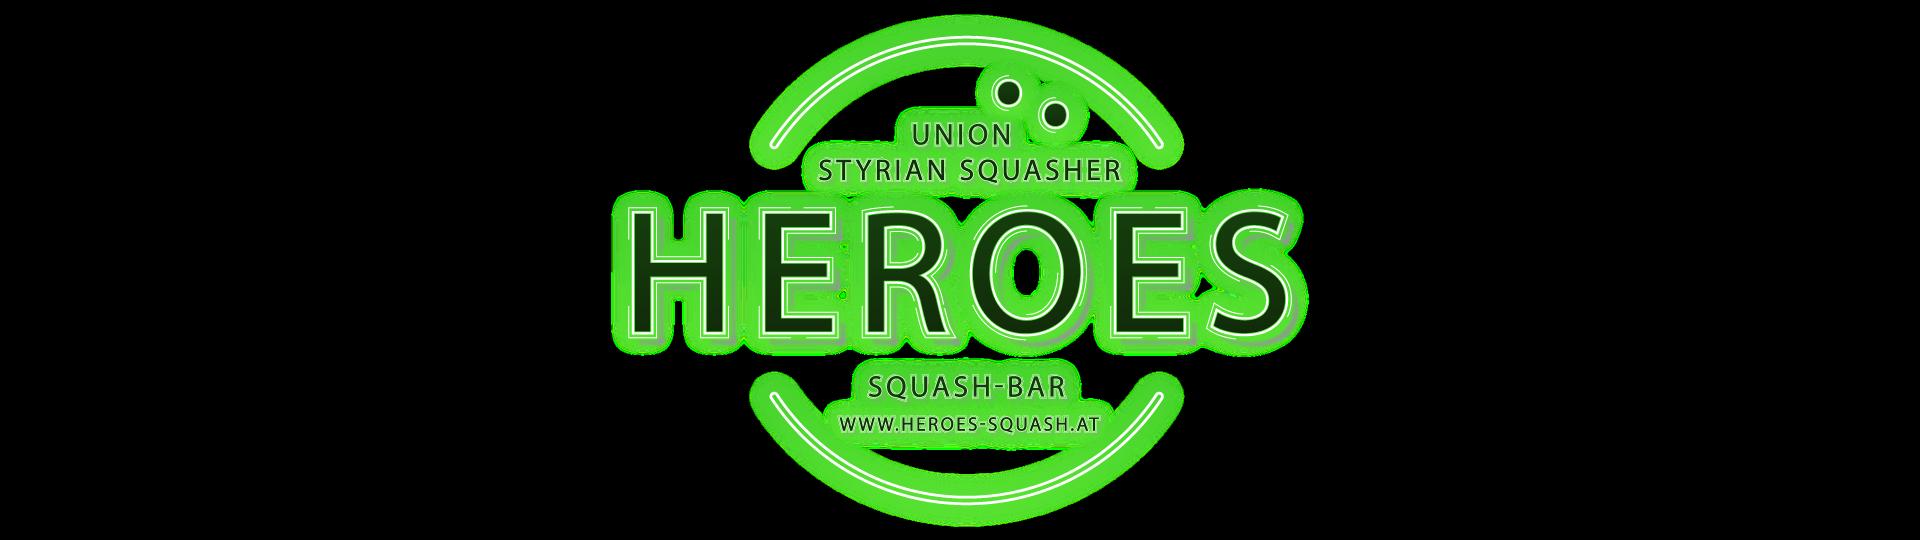 logo-coverphoto-background2